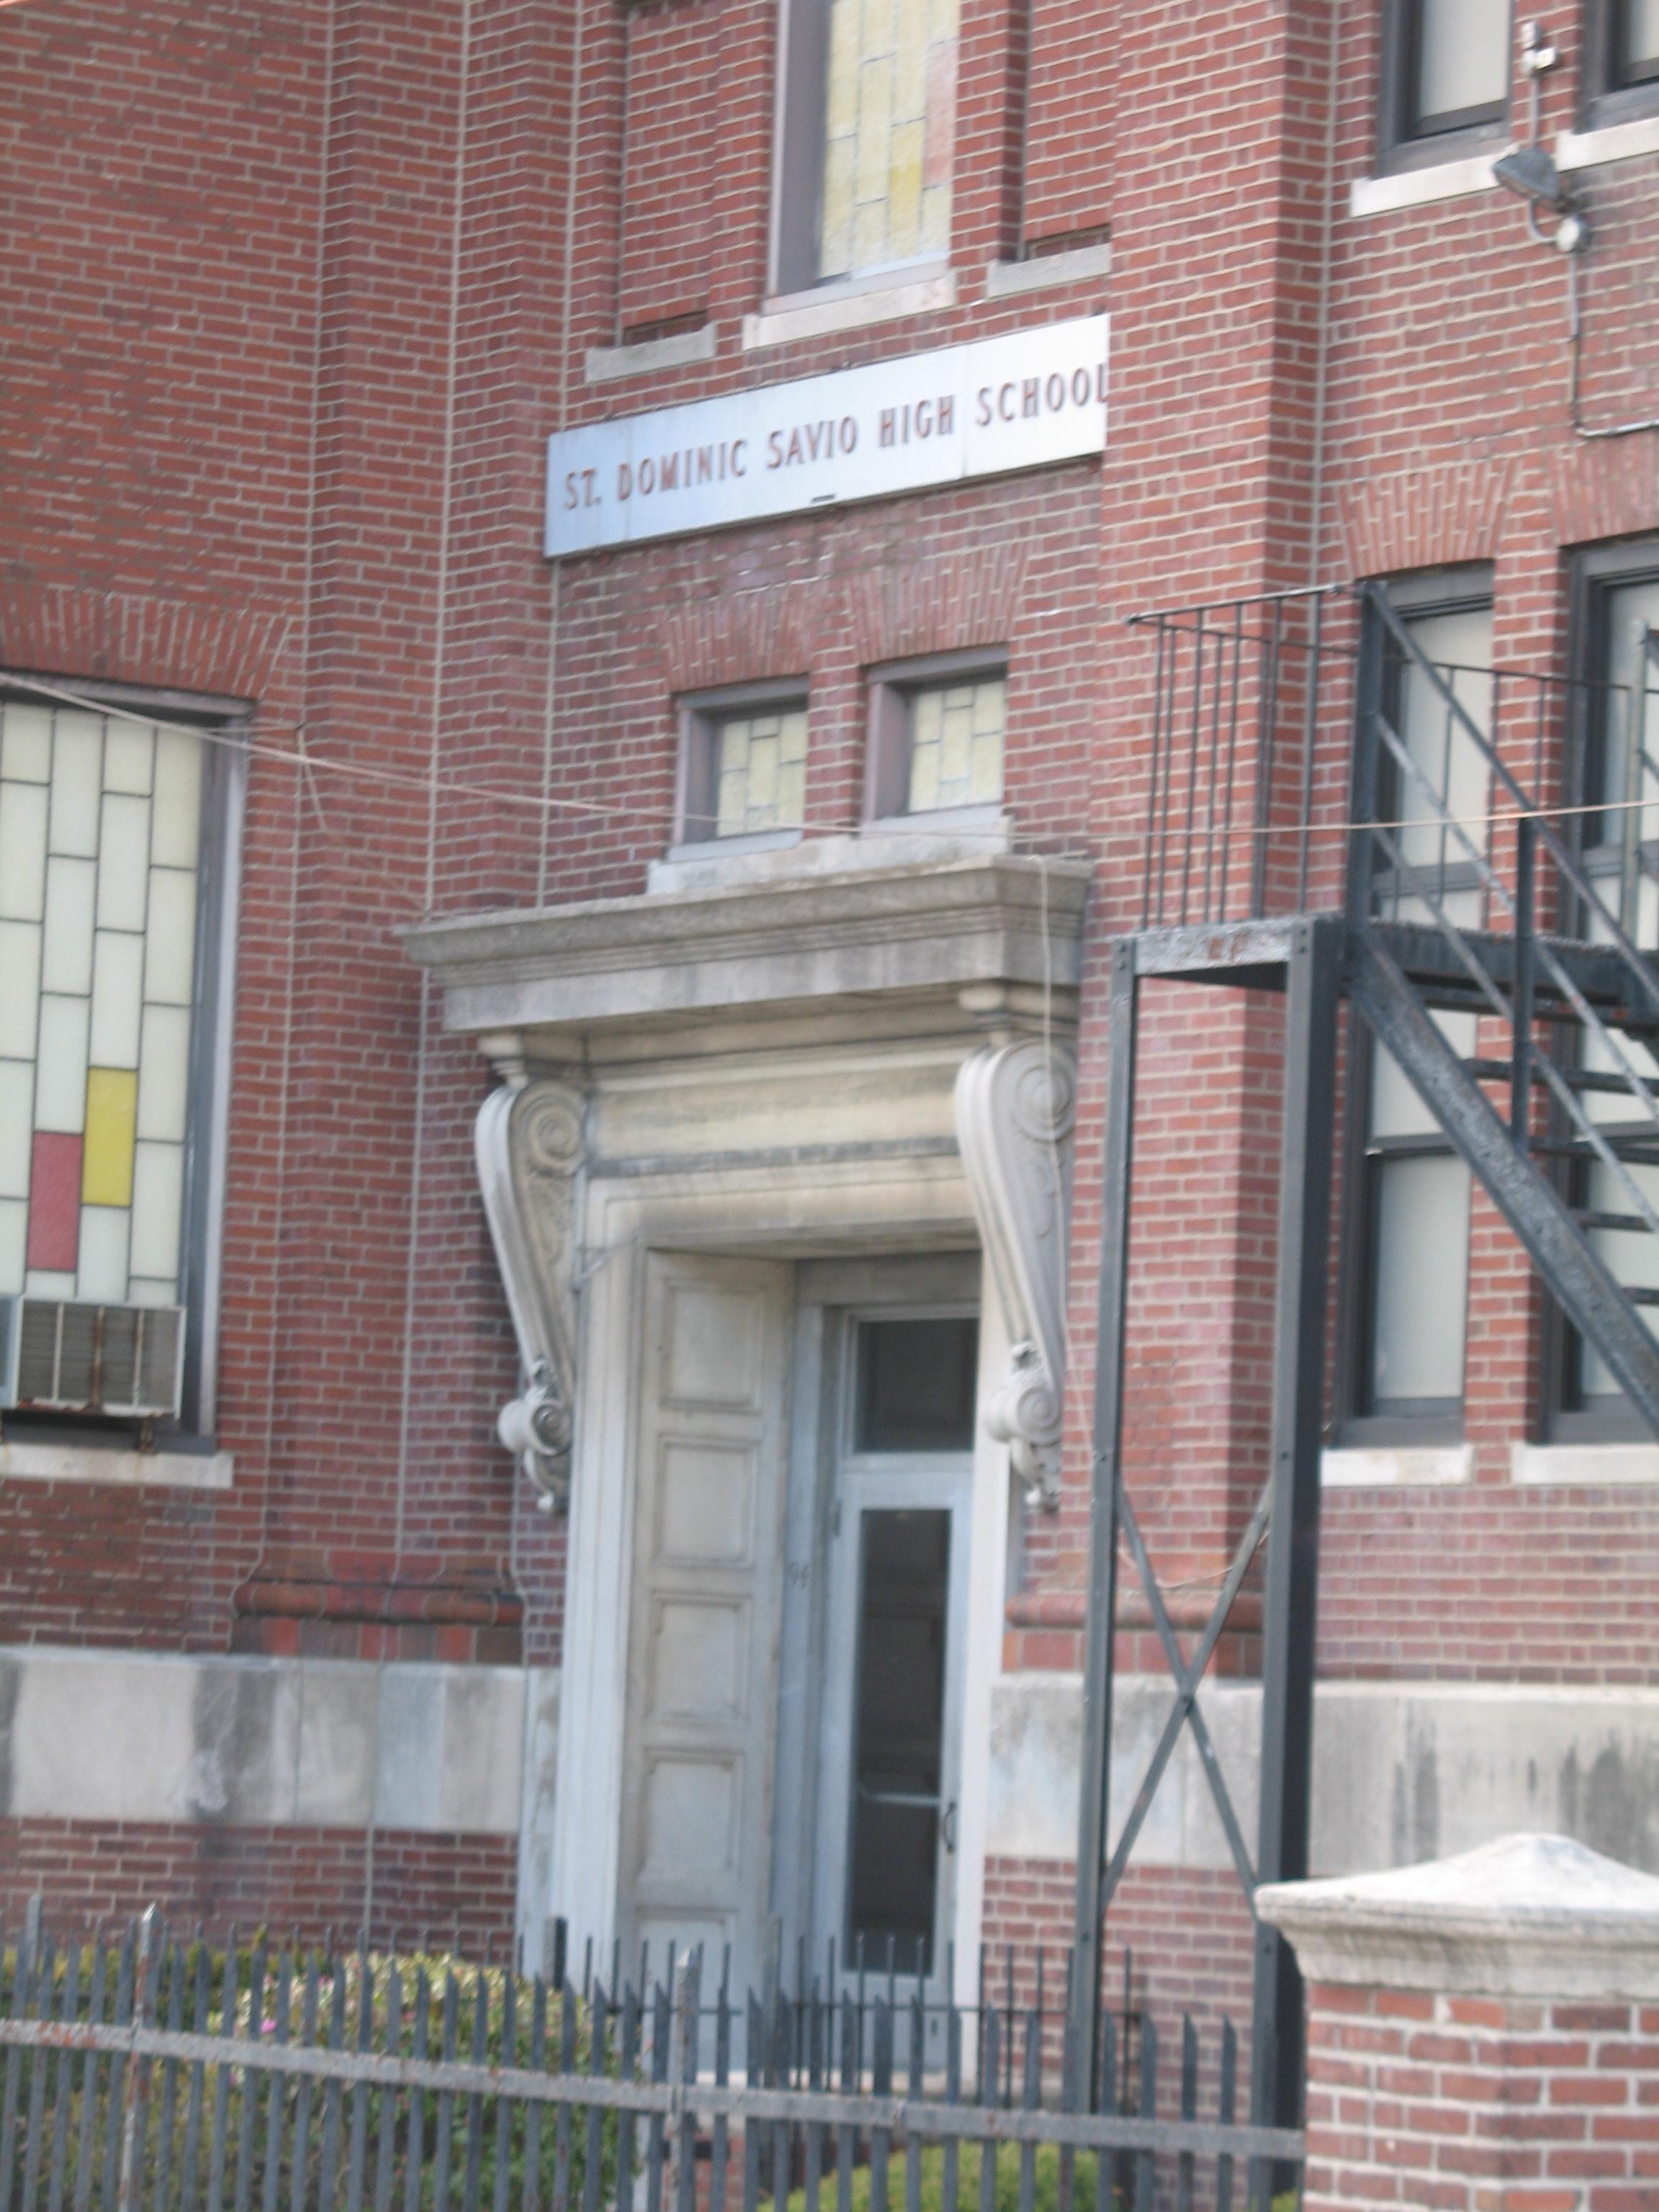 File:St  Dominic Savio High School (2) jpg - Wikimedia Commons